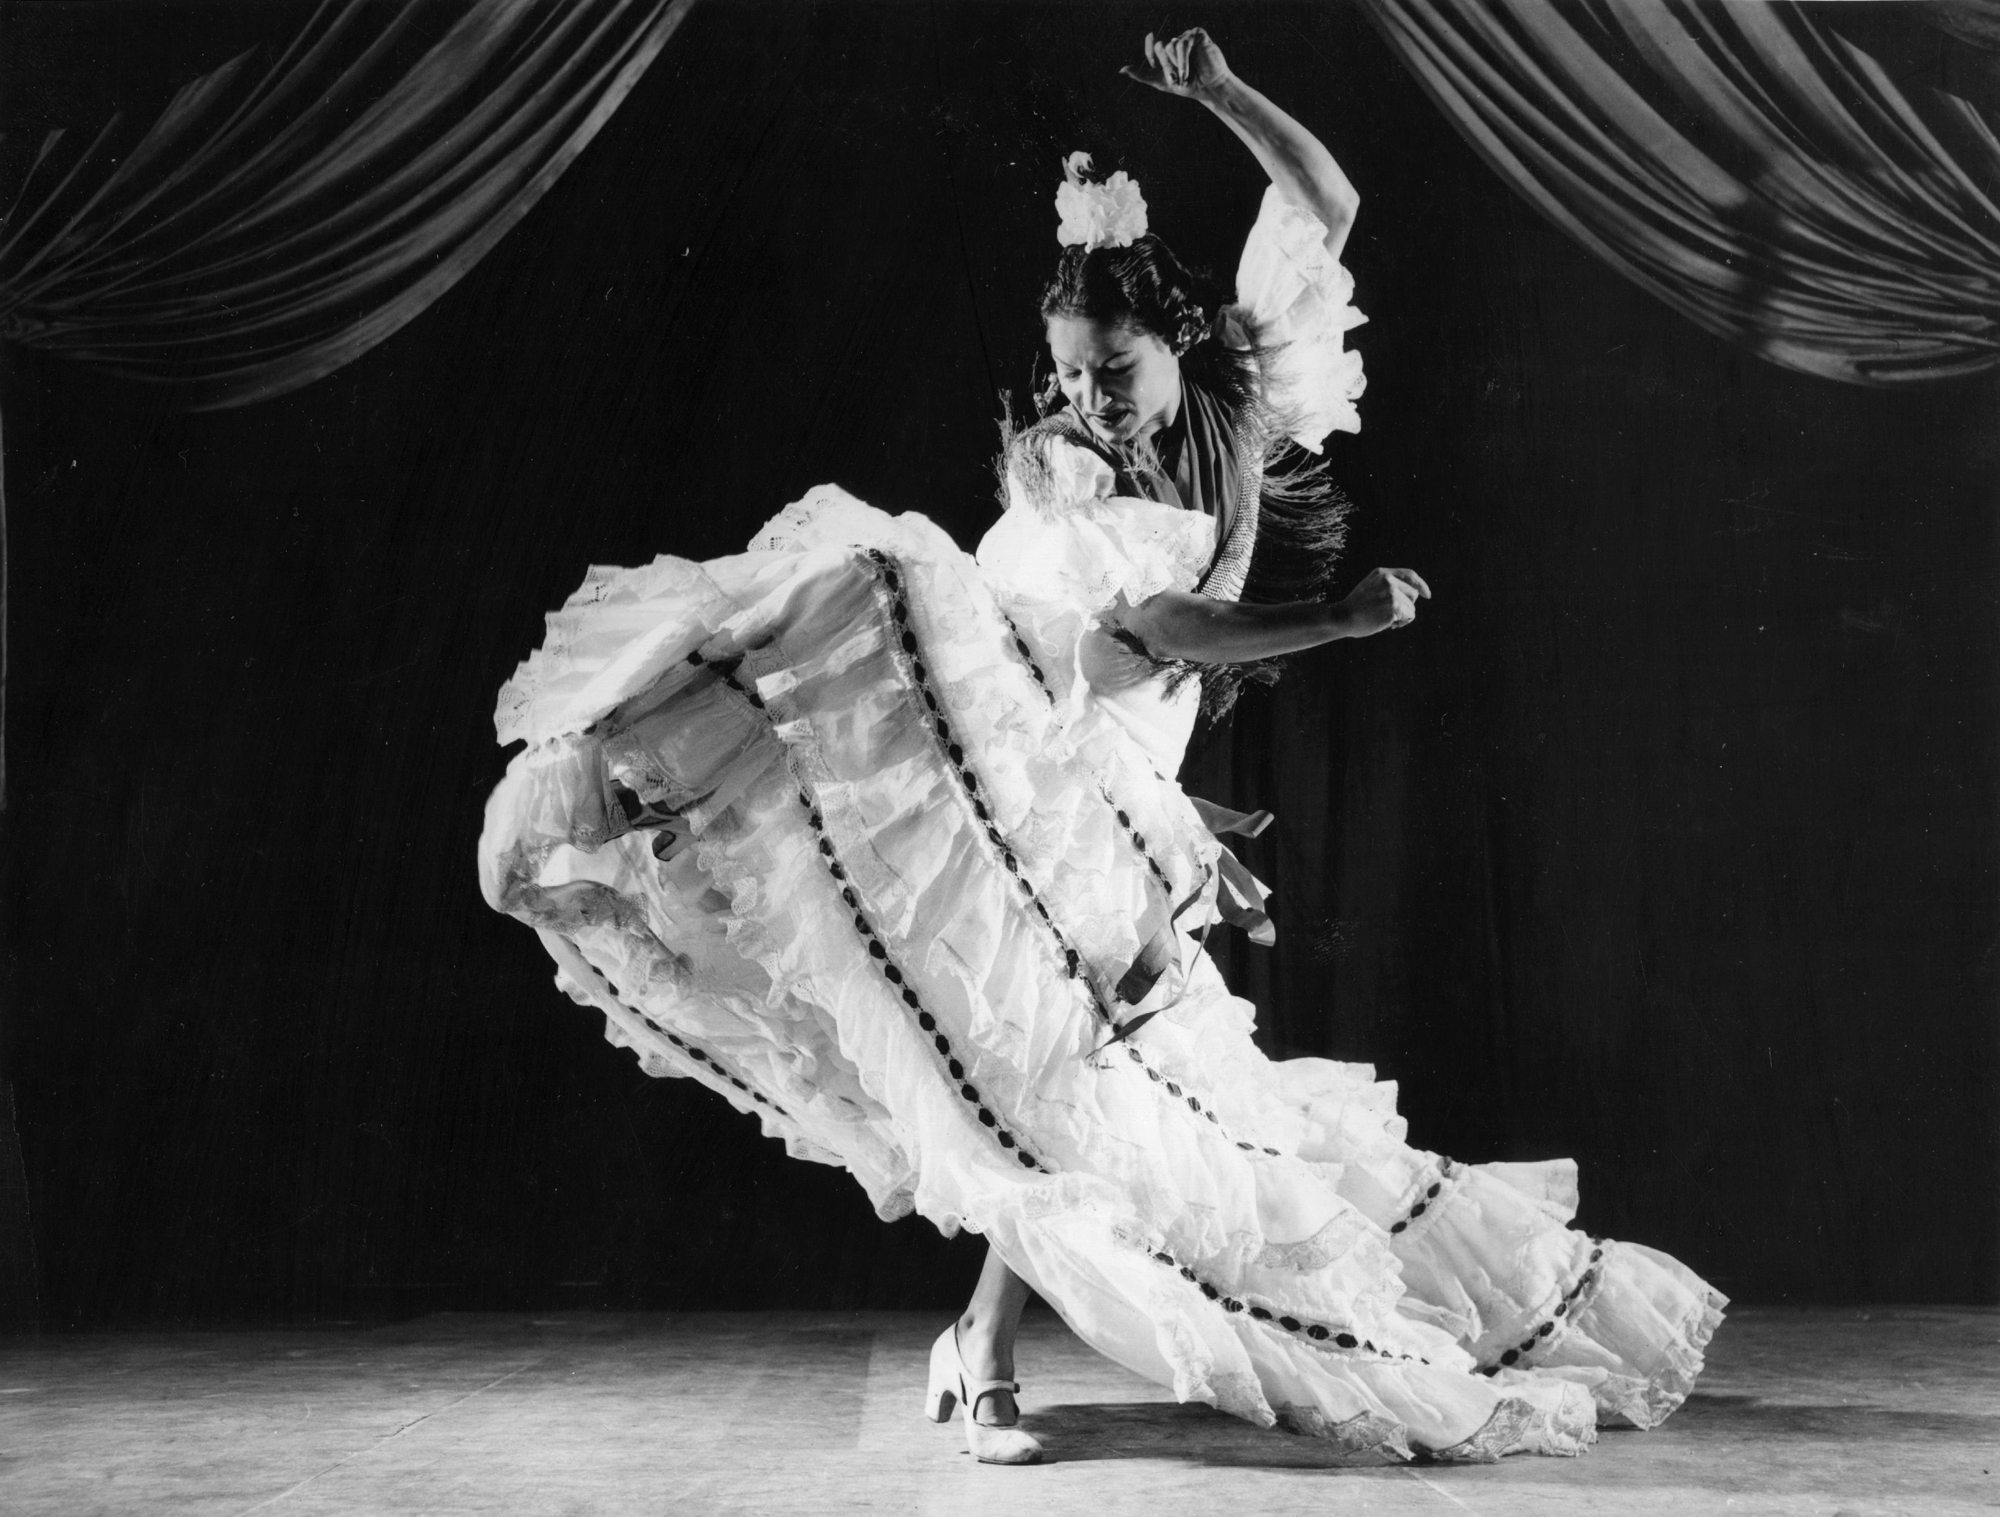 Carmen Amaya - The Queen of Flamenco | Alienated Me